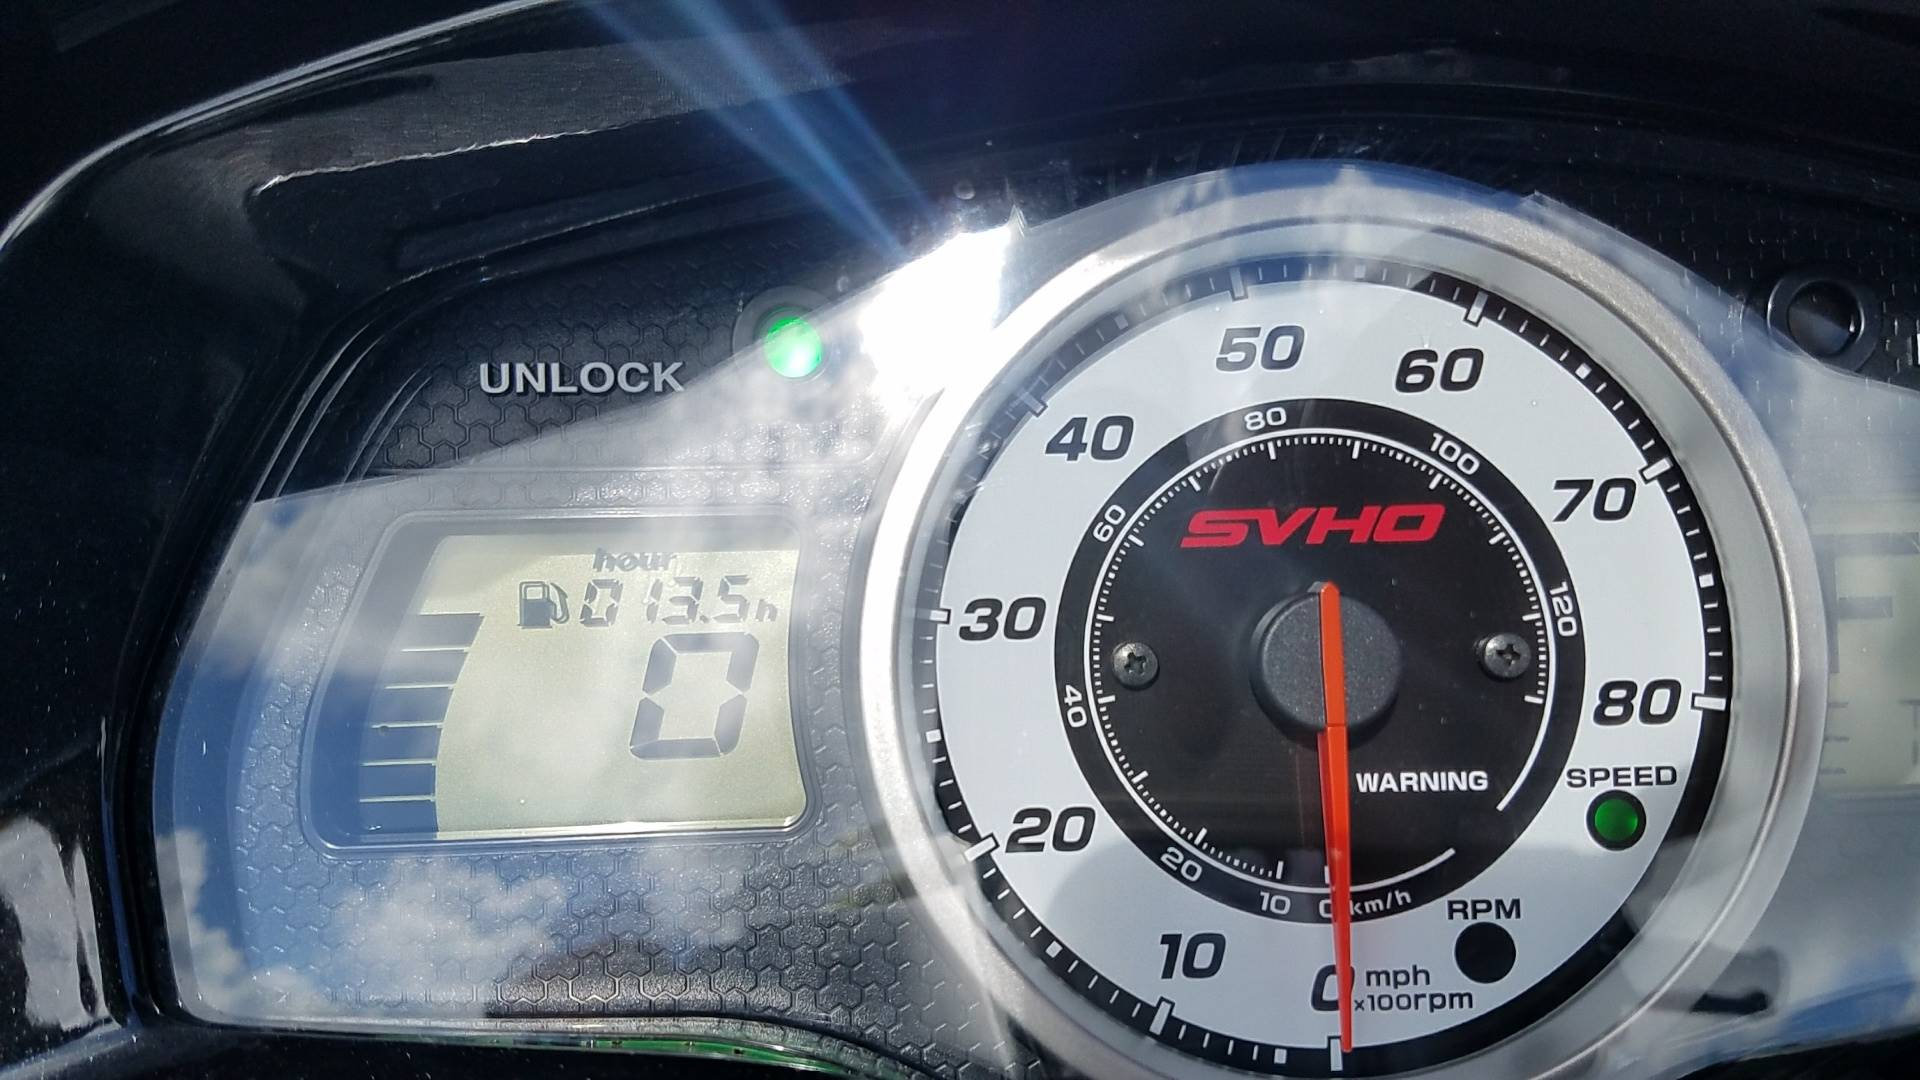 2016 Yamaha FX Cruiser SVHO 8